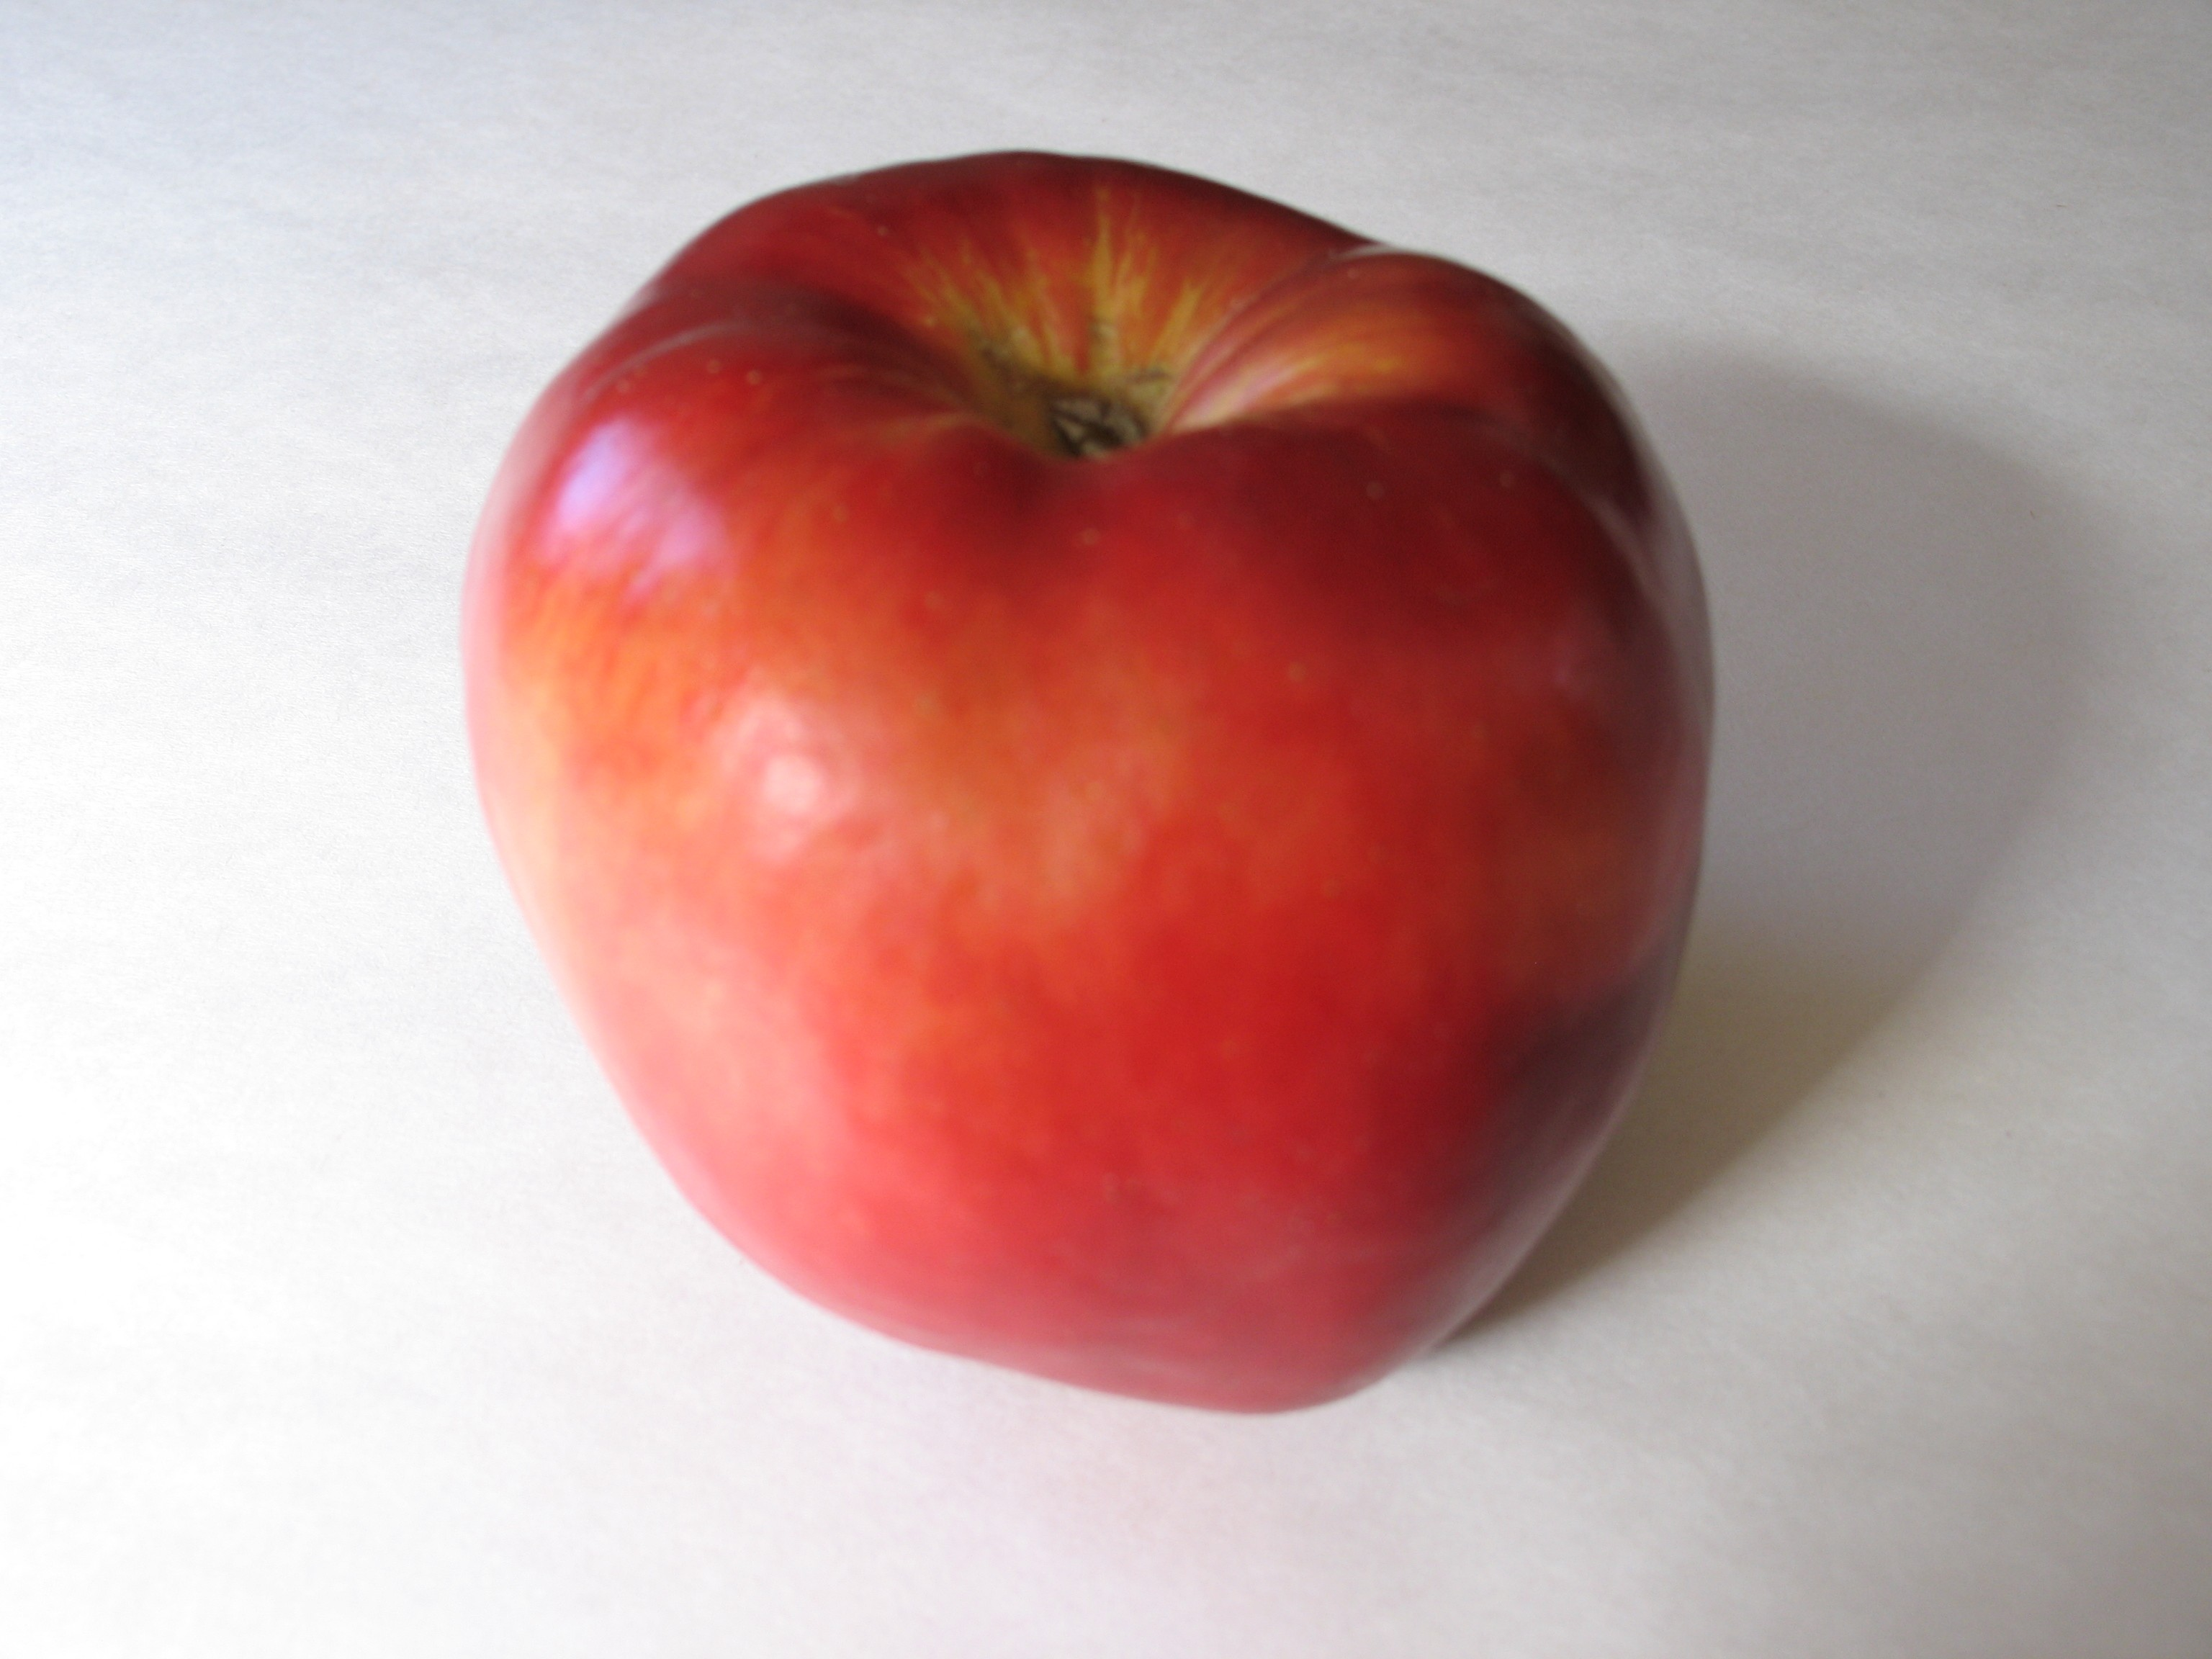 apple - PHOTO BY BOB DORAN